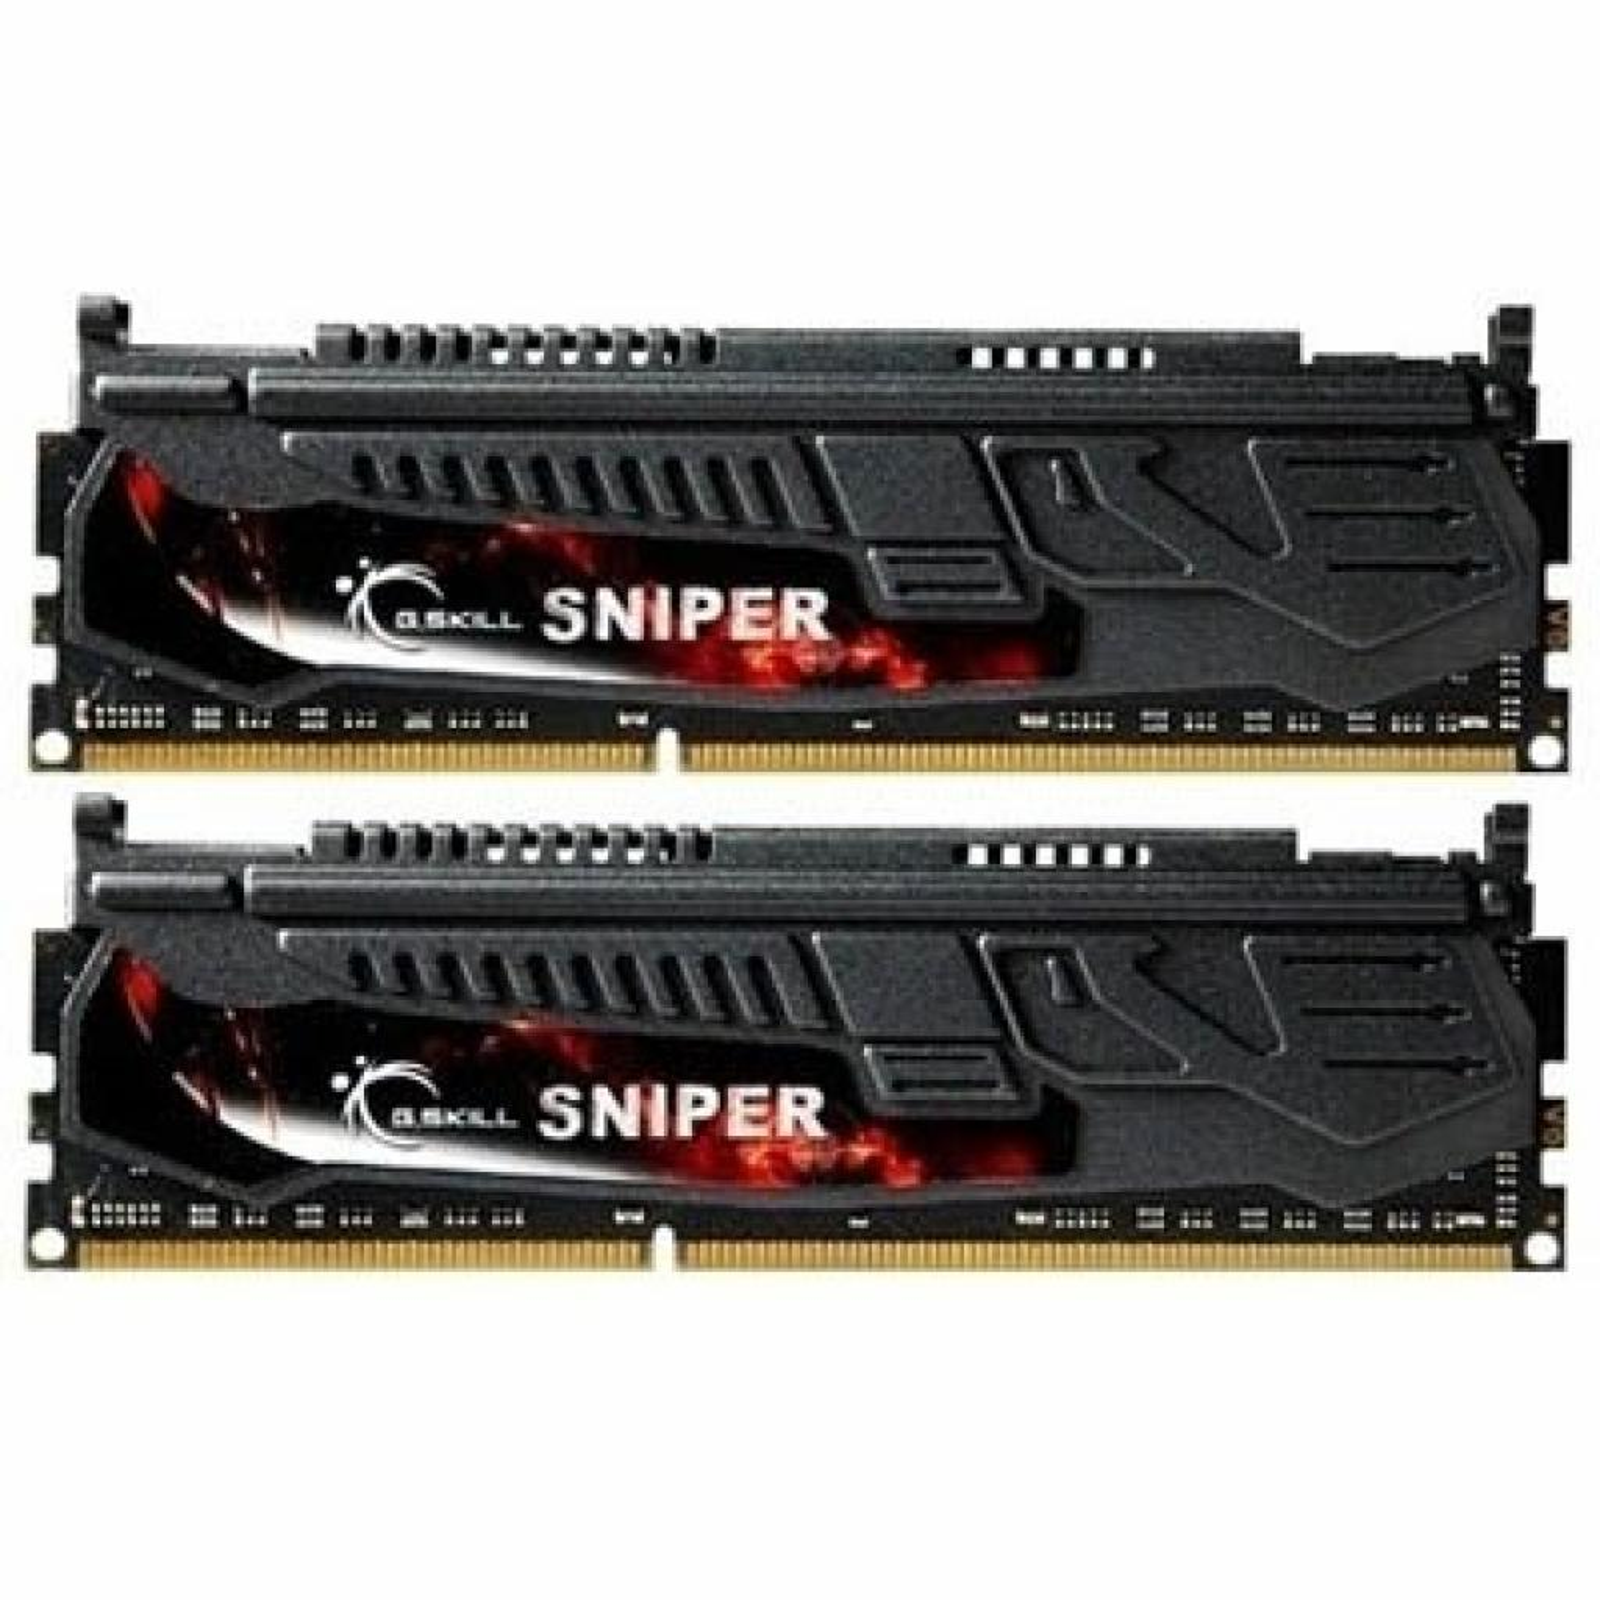 Модуль памяти для компьютера DDR3 16GB (2x8GB) 1866 MHz G.Skill (F3-1866C9D-16GSR)